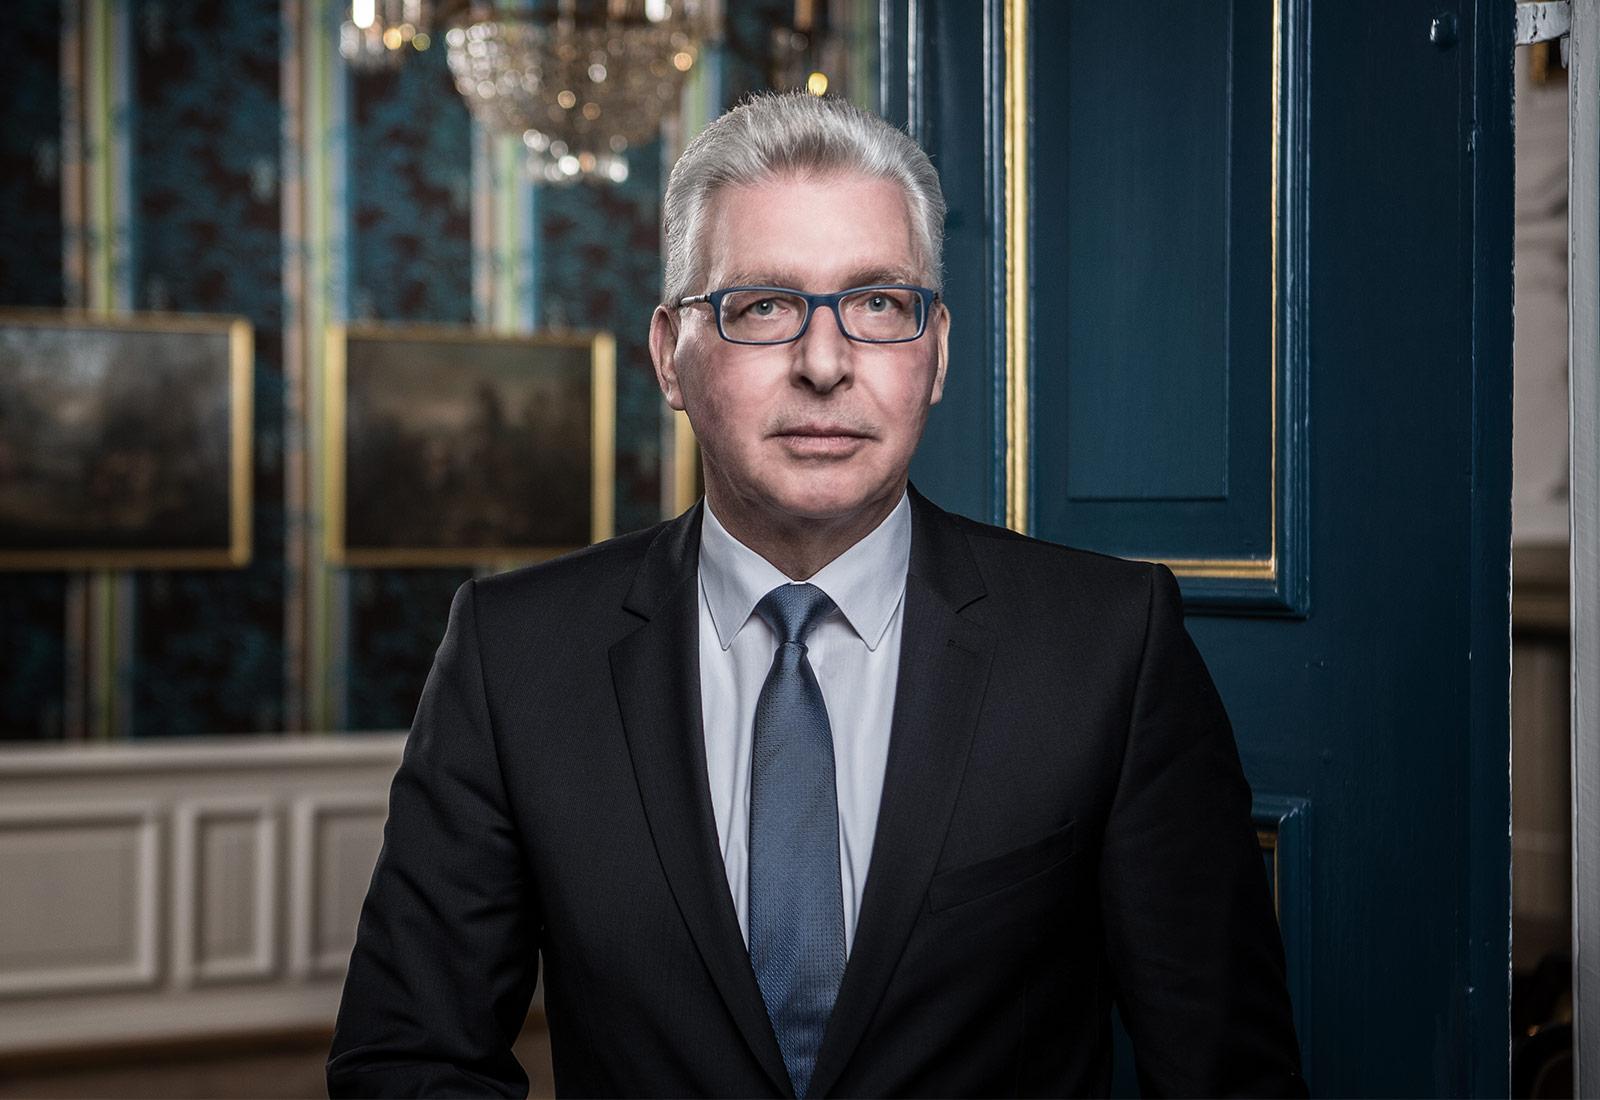 Hans Joachim Bartels